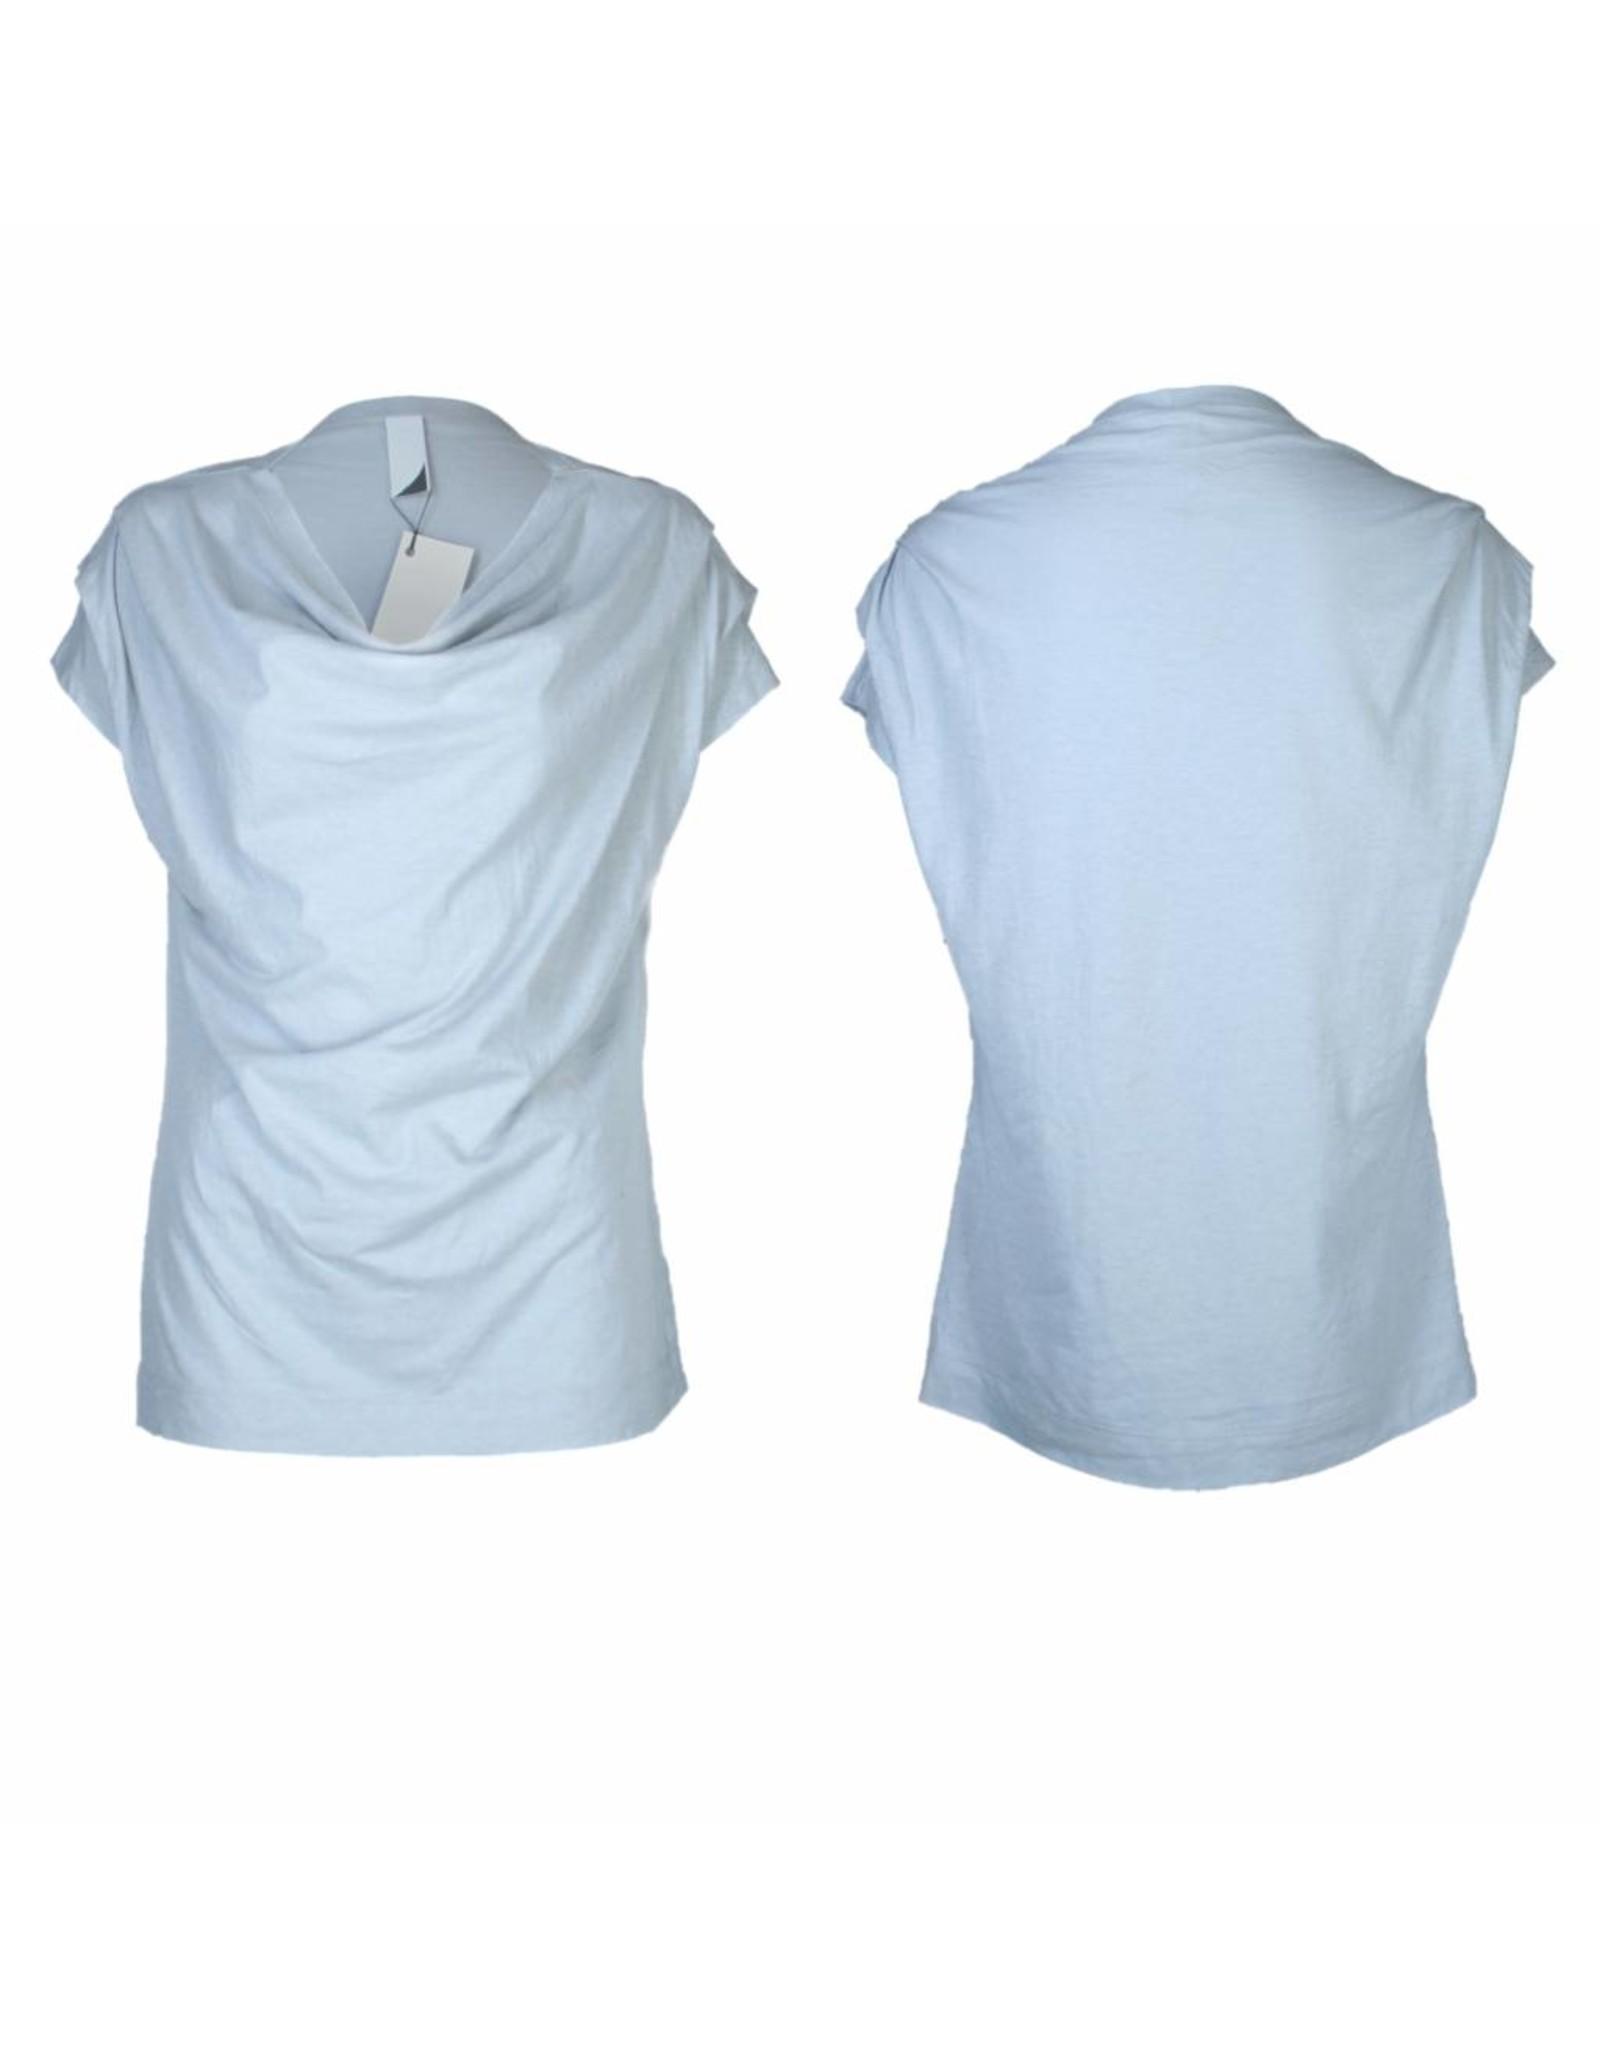 format TJEK shirt, cotton-hemp